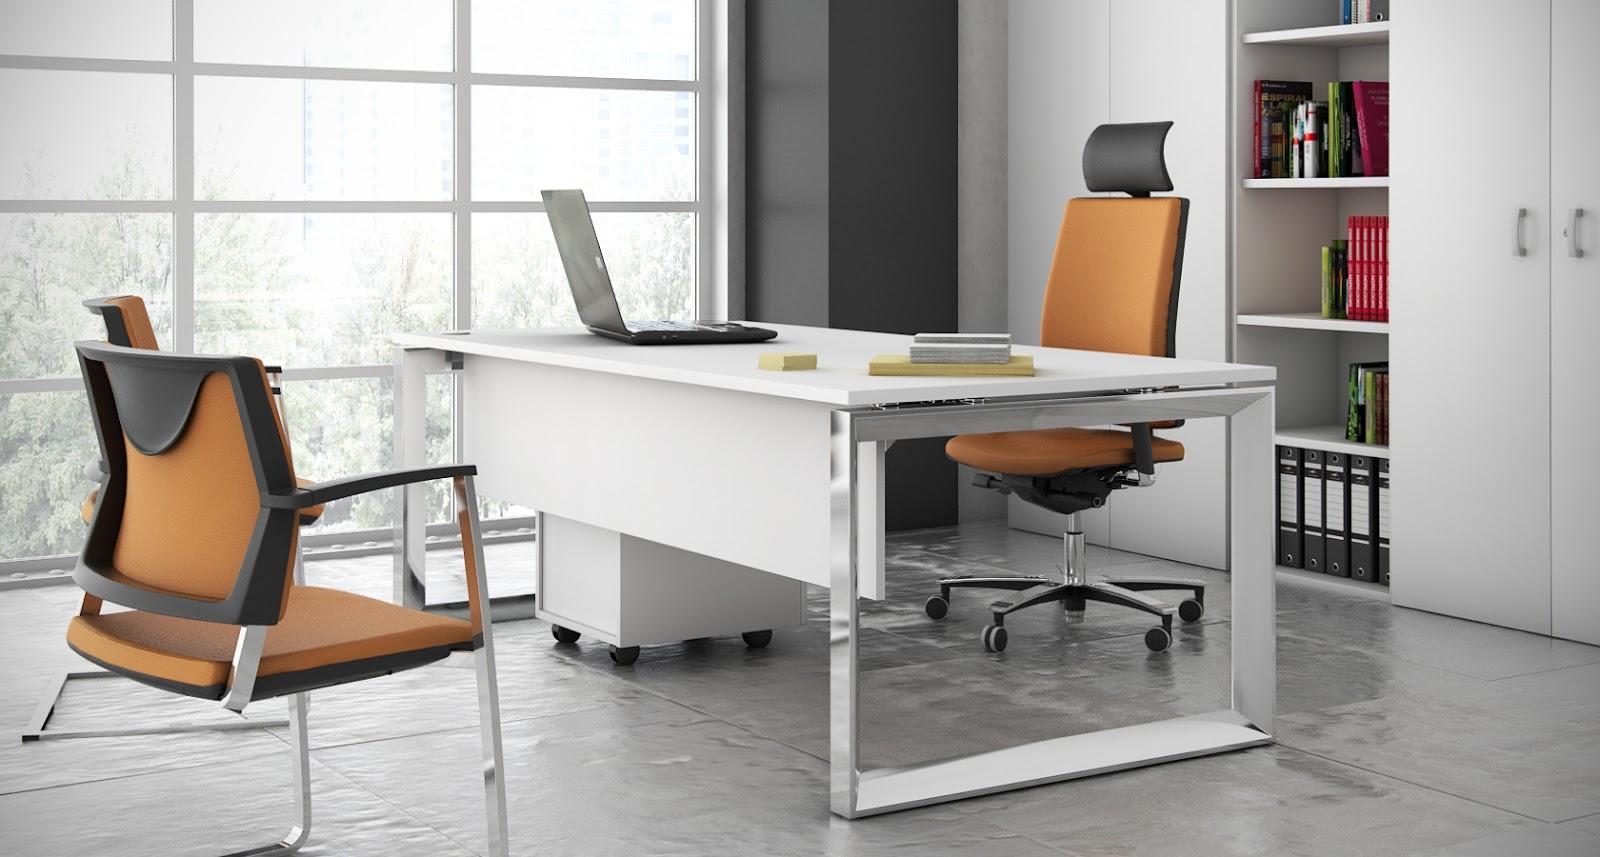 Oficina total nueva serie star de mobiliario for Mobiliario de oficina pamplona